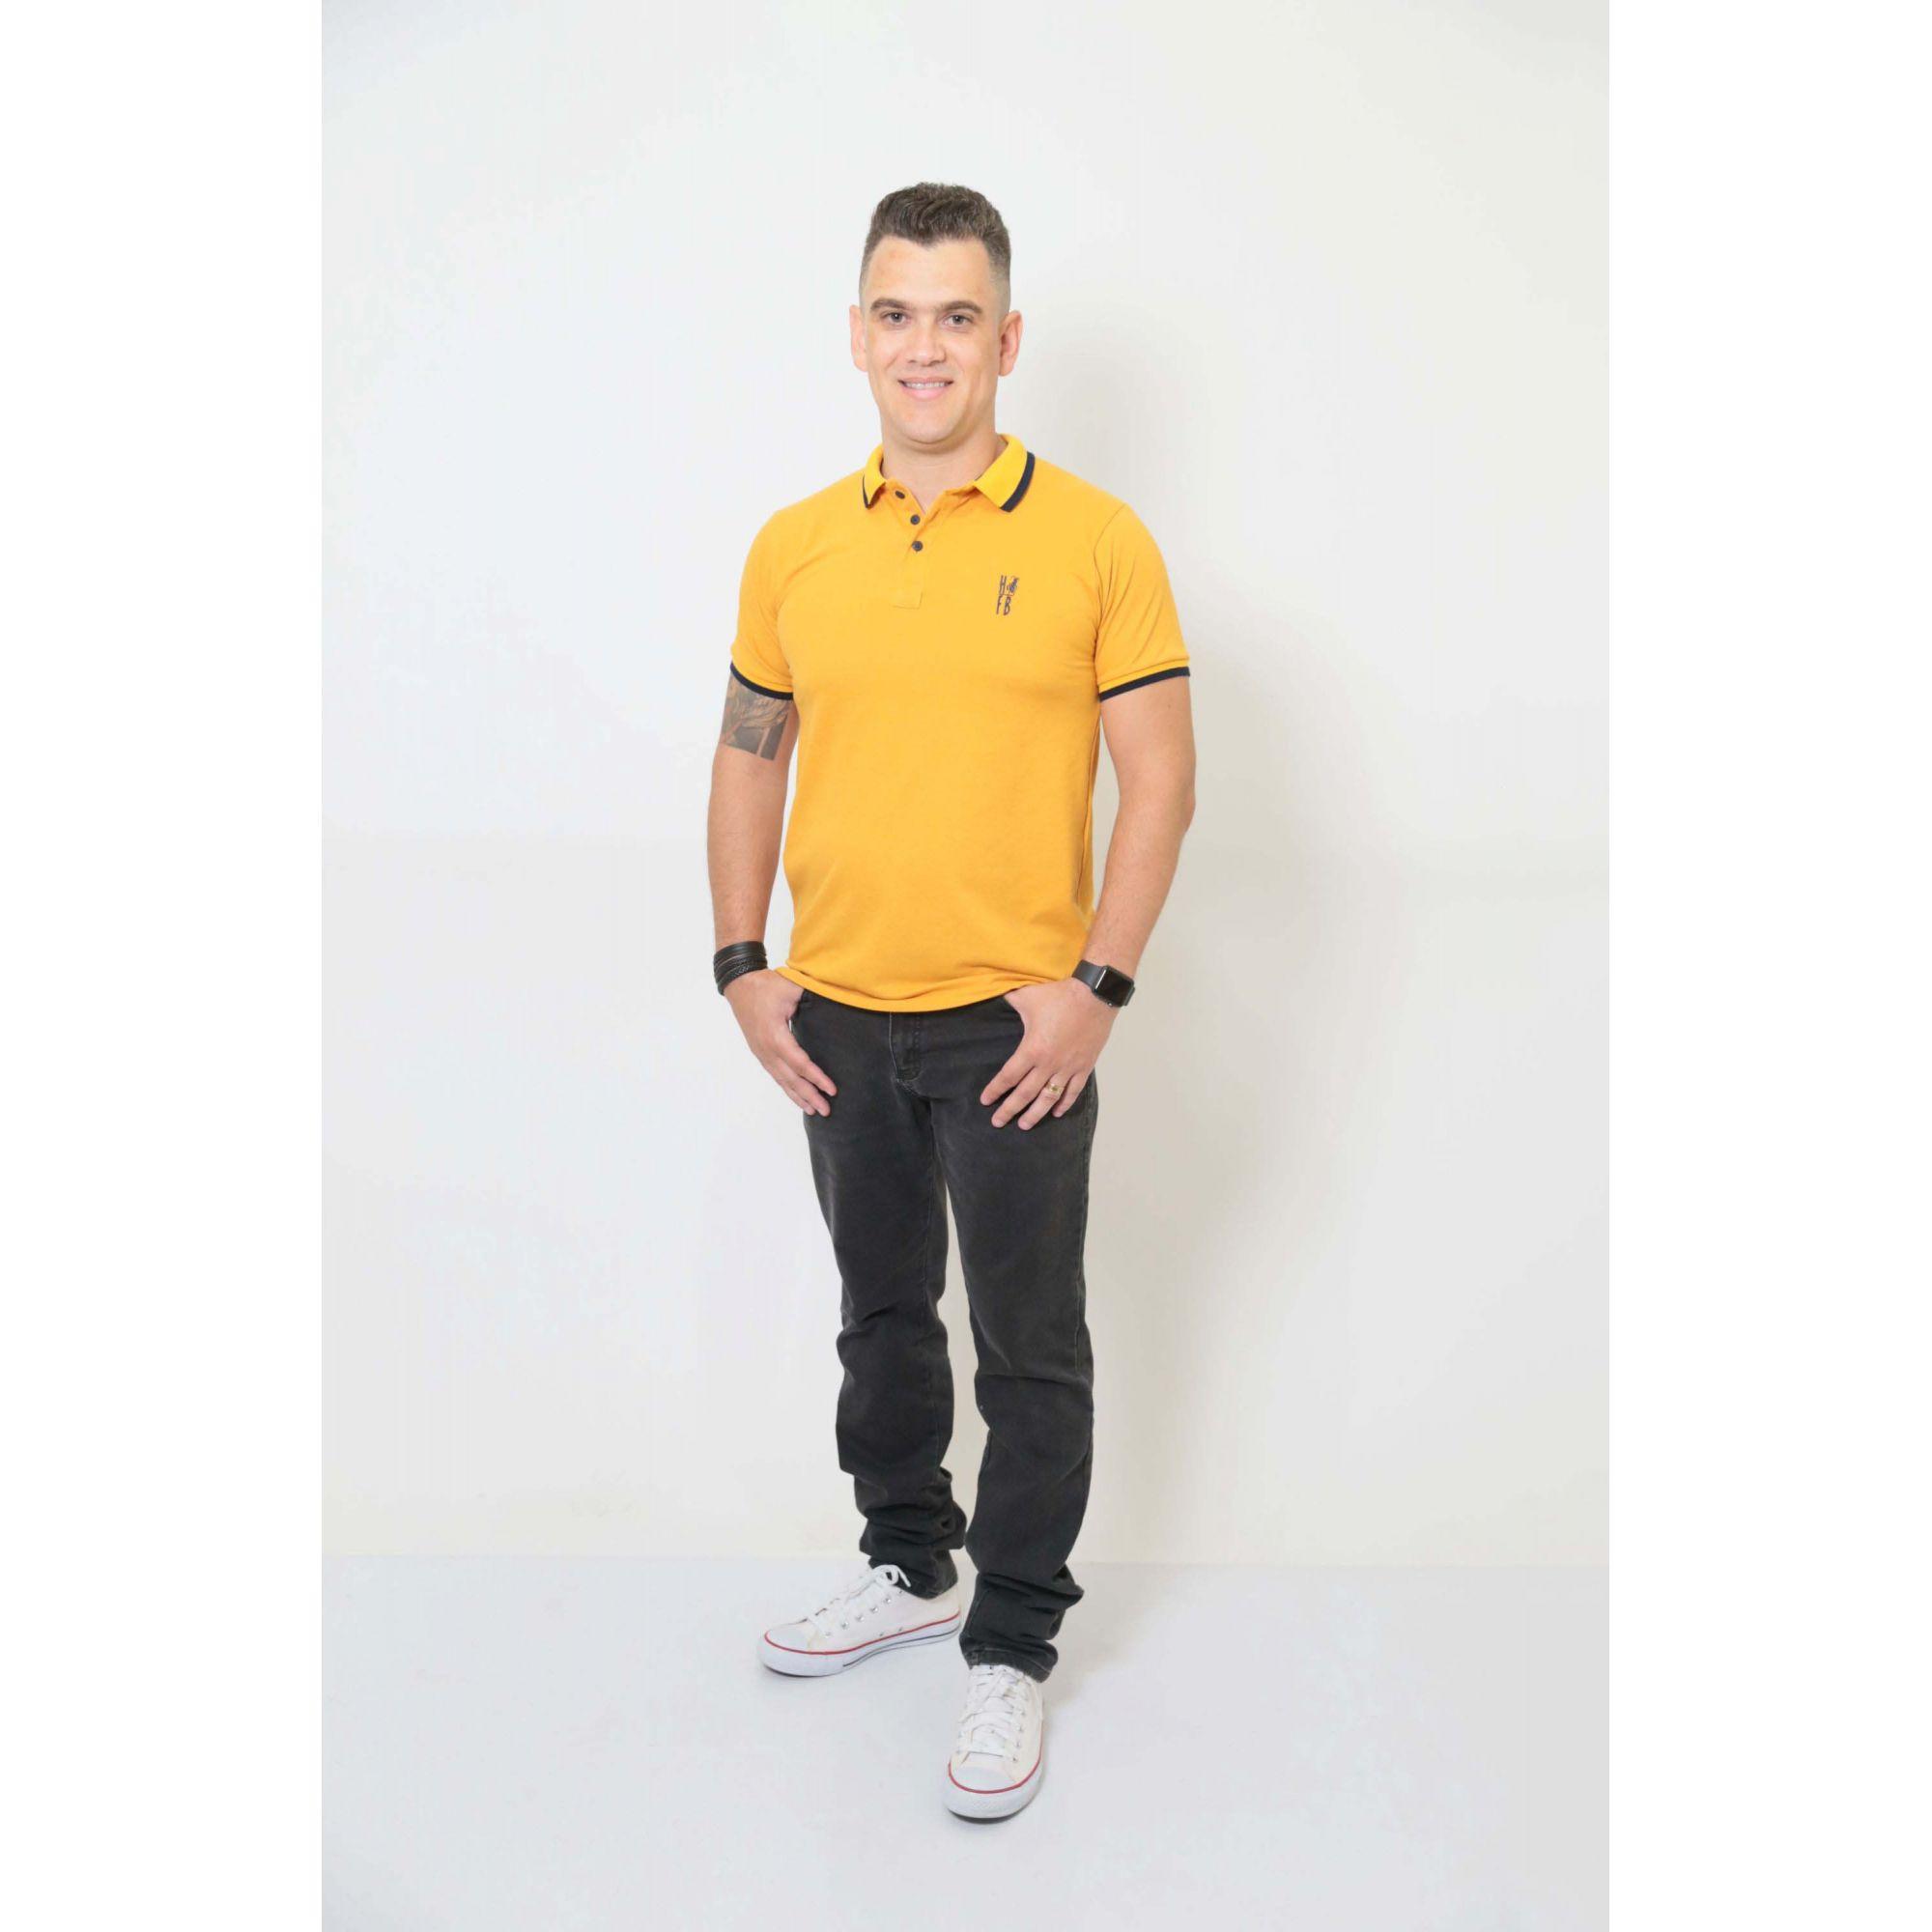 PAI E FILHOS > Kit 02 Peças Camisa + Body Polo - Mostarda  [Coleção Tal Pai Tal Filho]  - Heitor Fashion Brazil